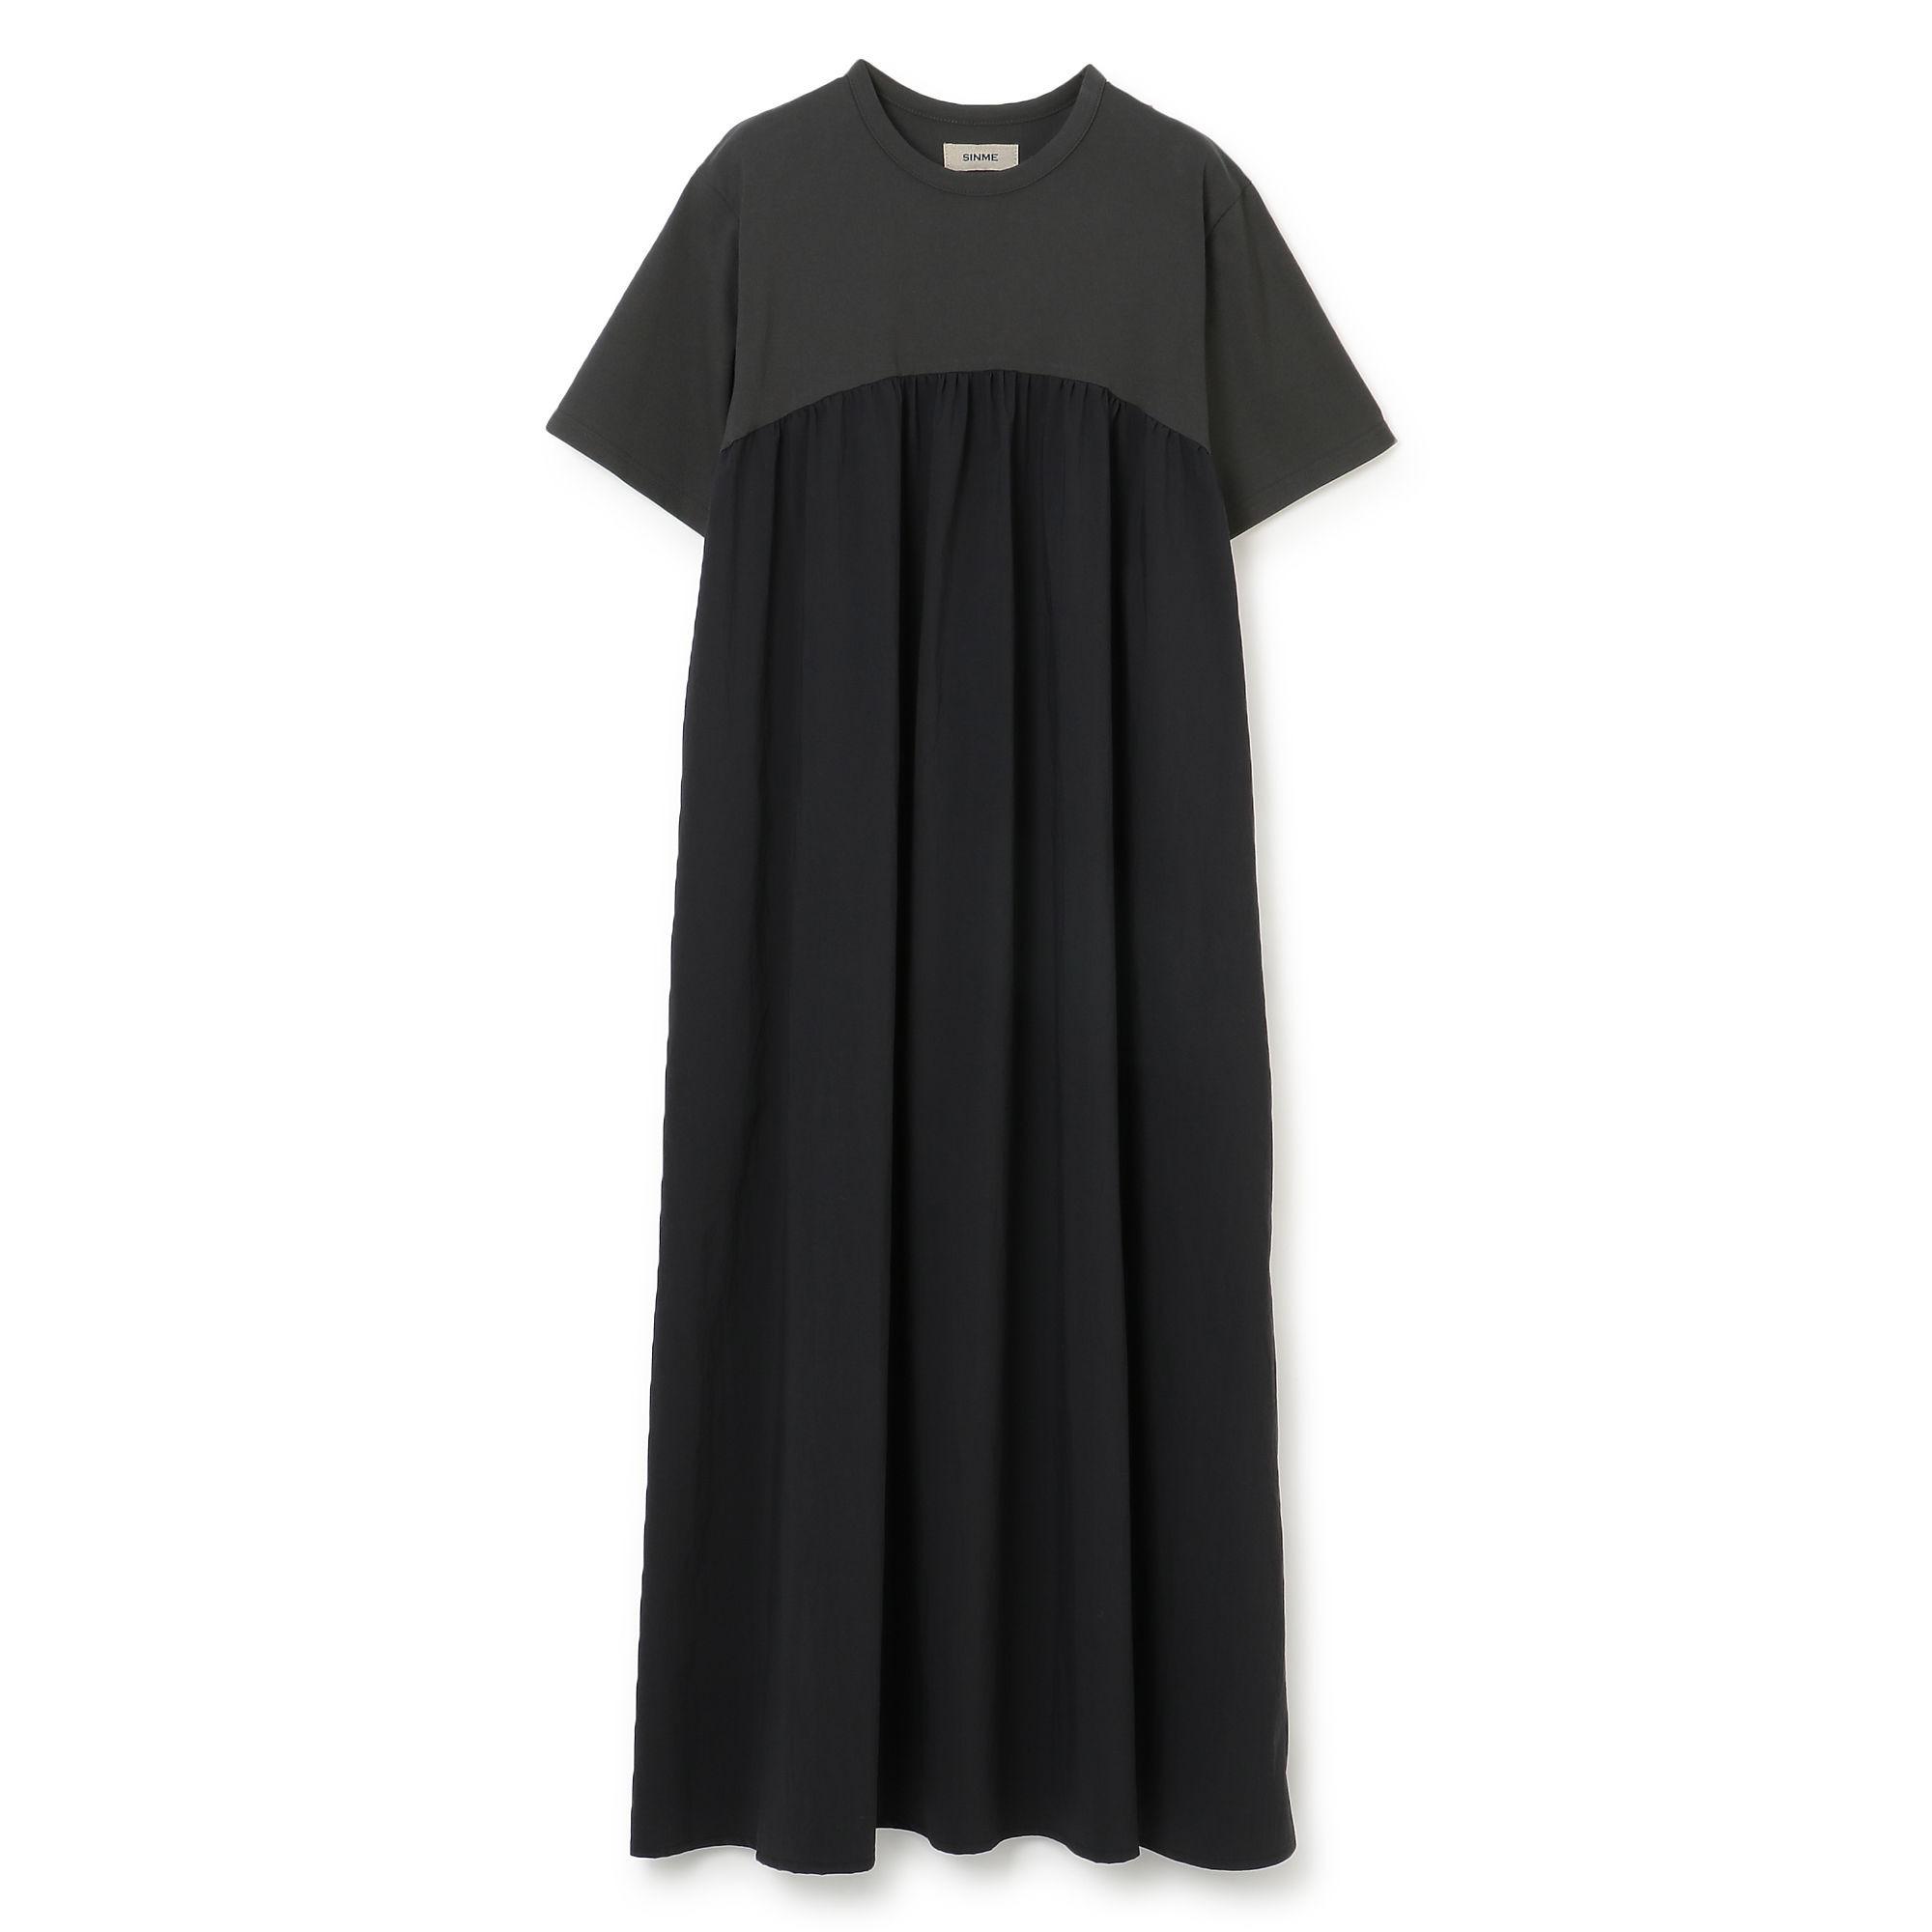 SINME TシャツOP ¥35,200(税込)